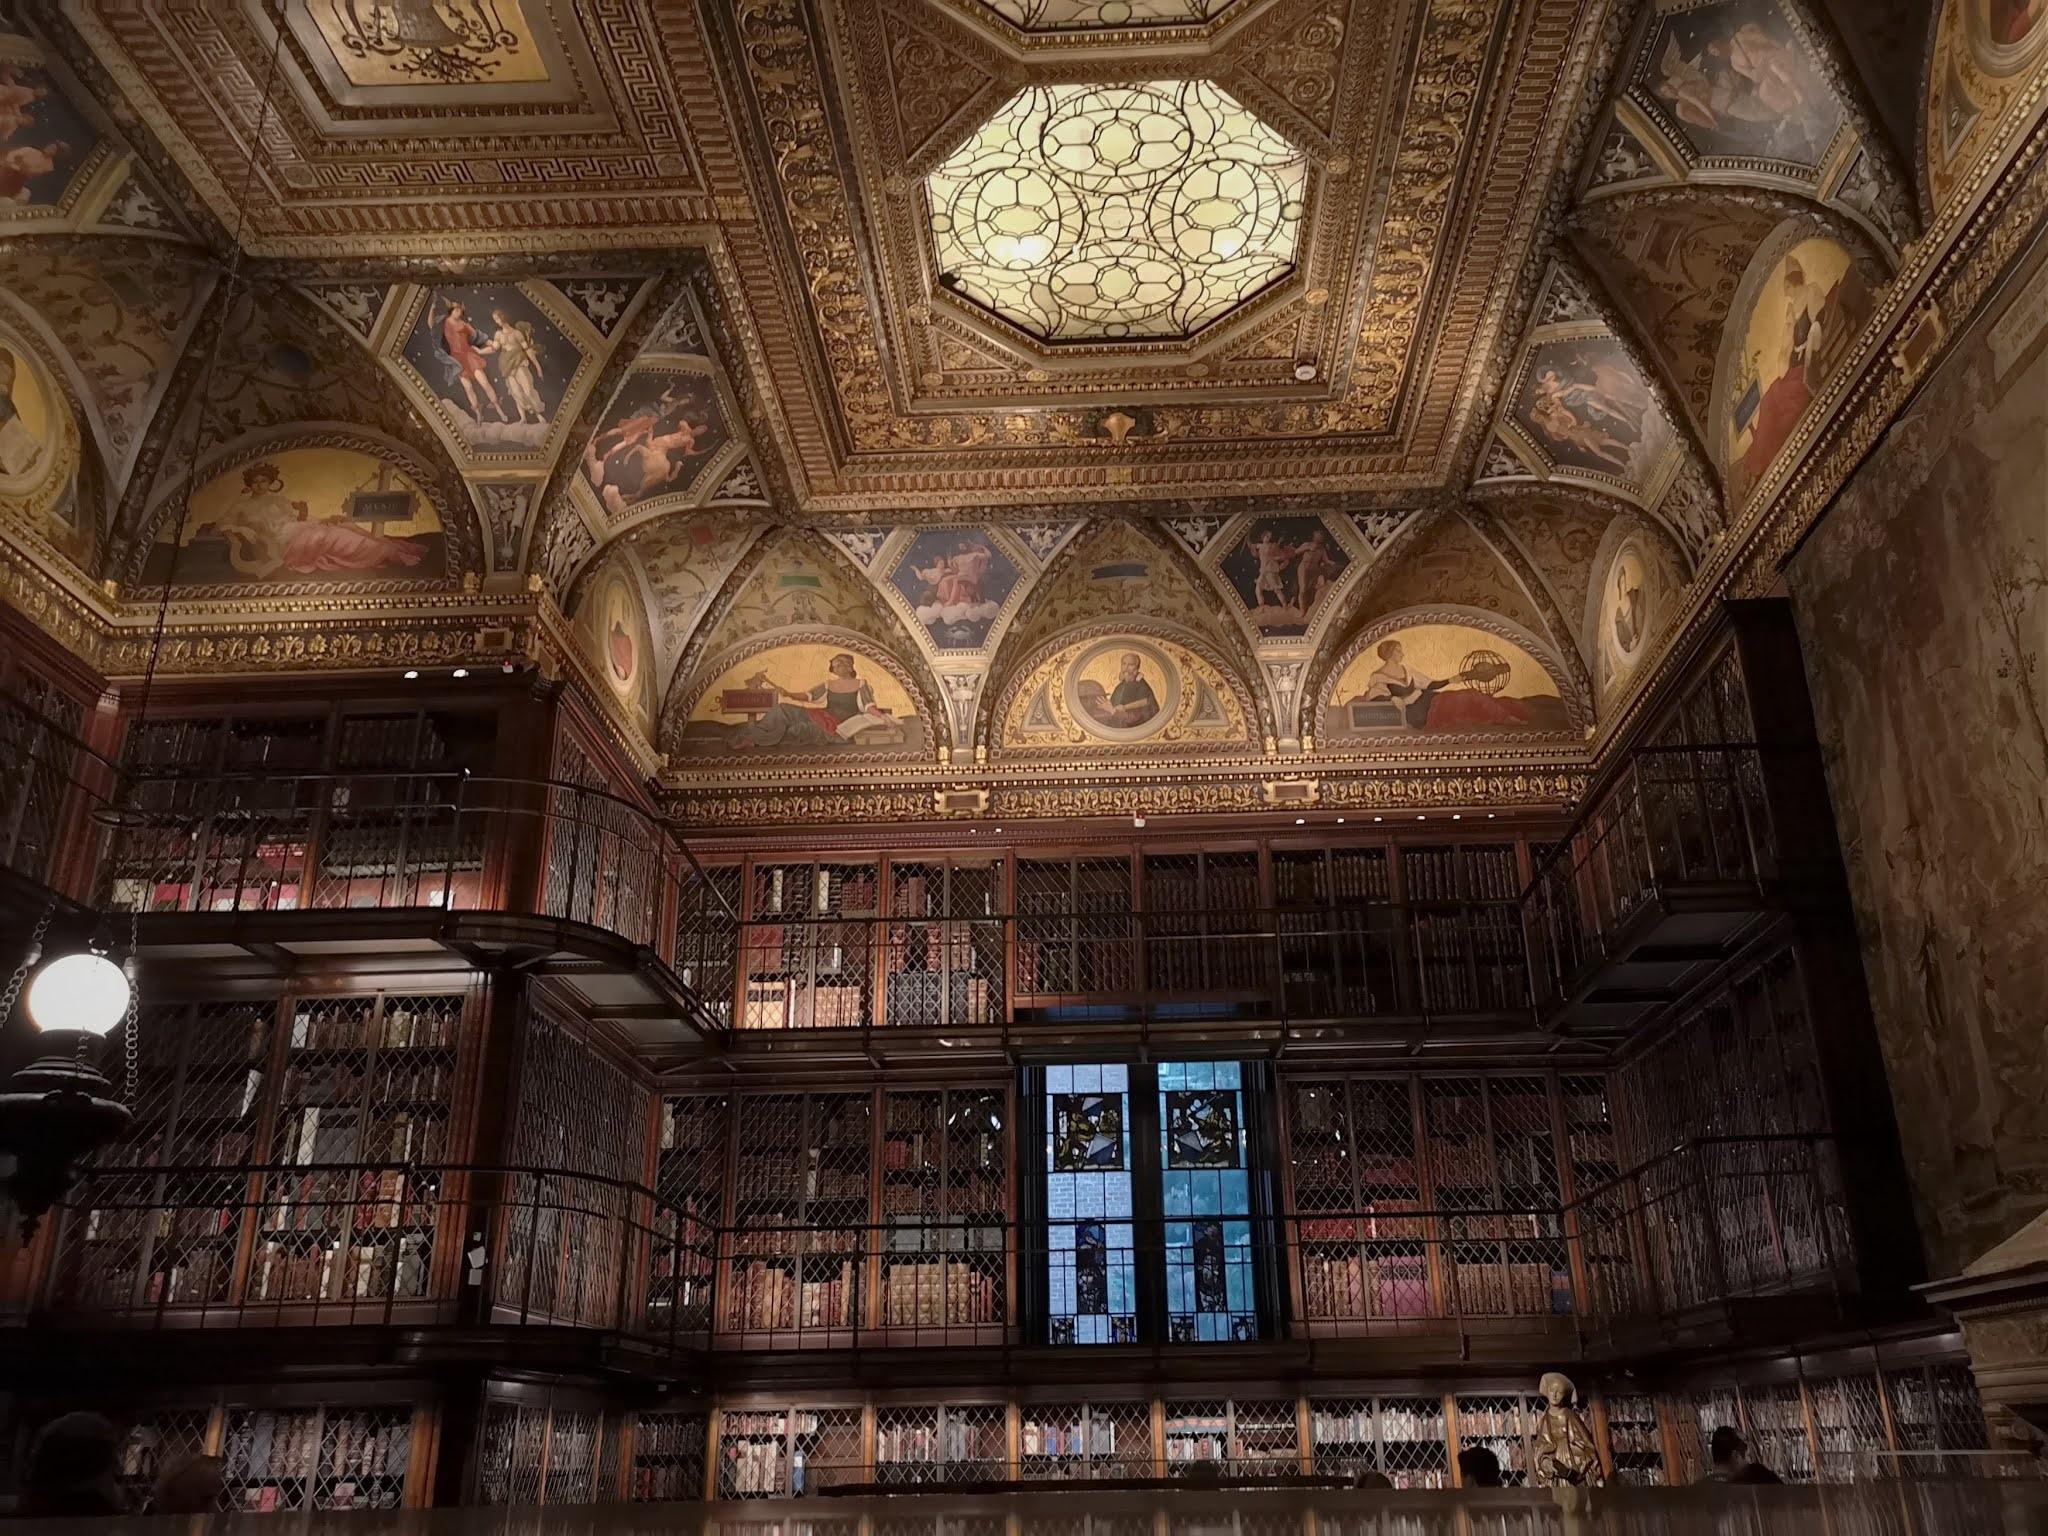 Morgan Library & Museum, New York City